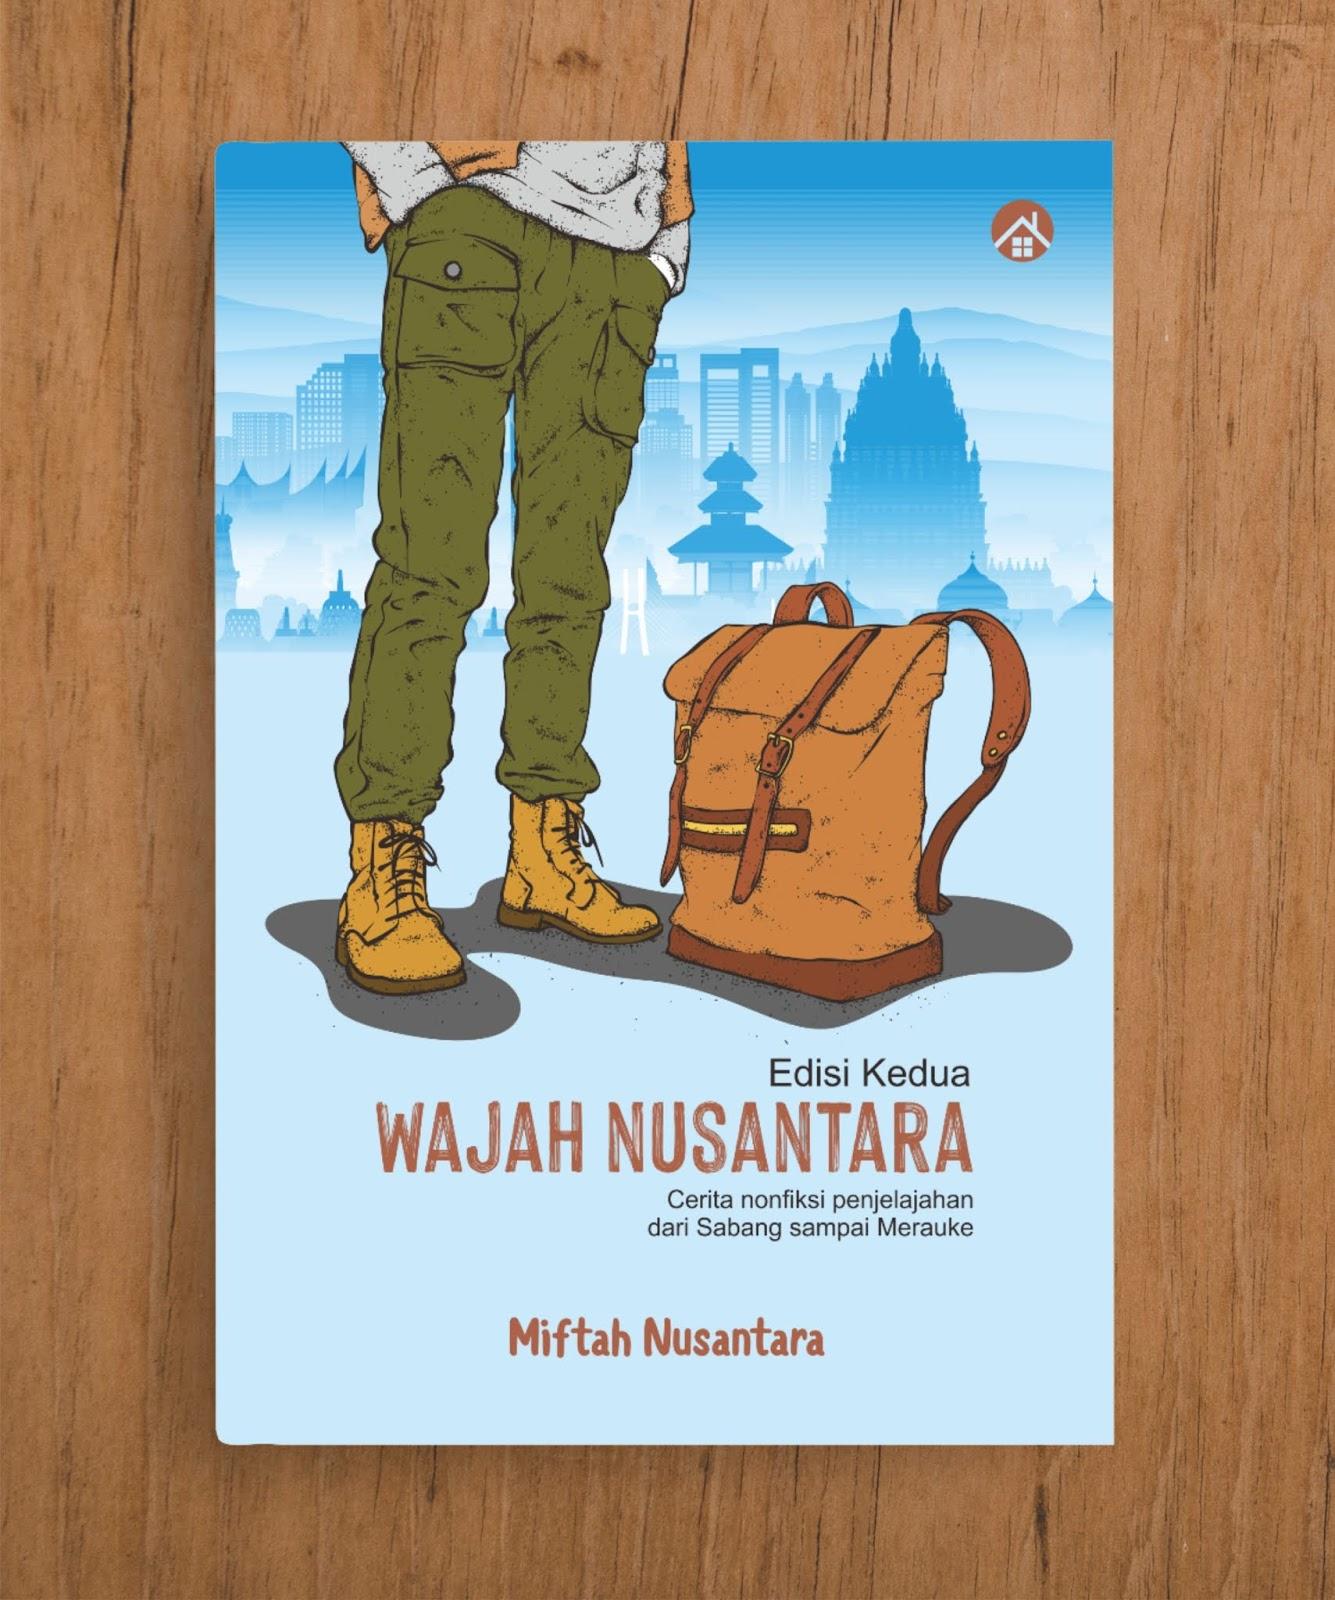 Wajah Nusantara (Edisi Kedua)